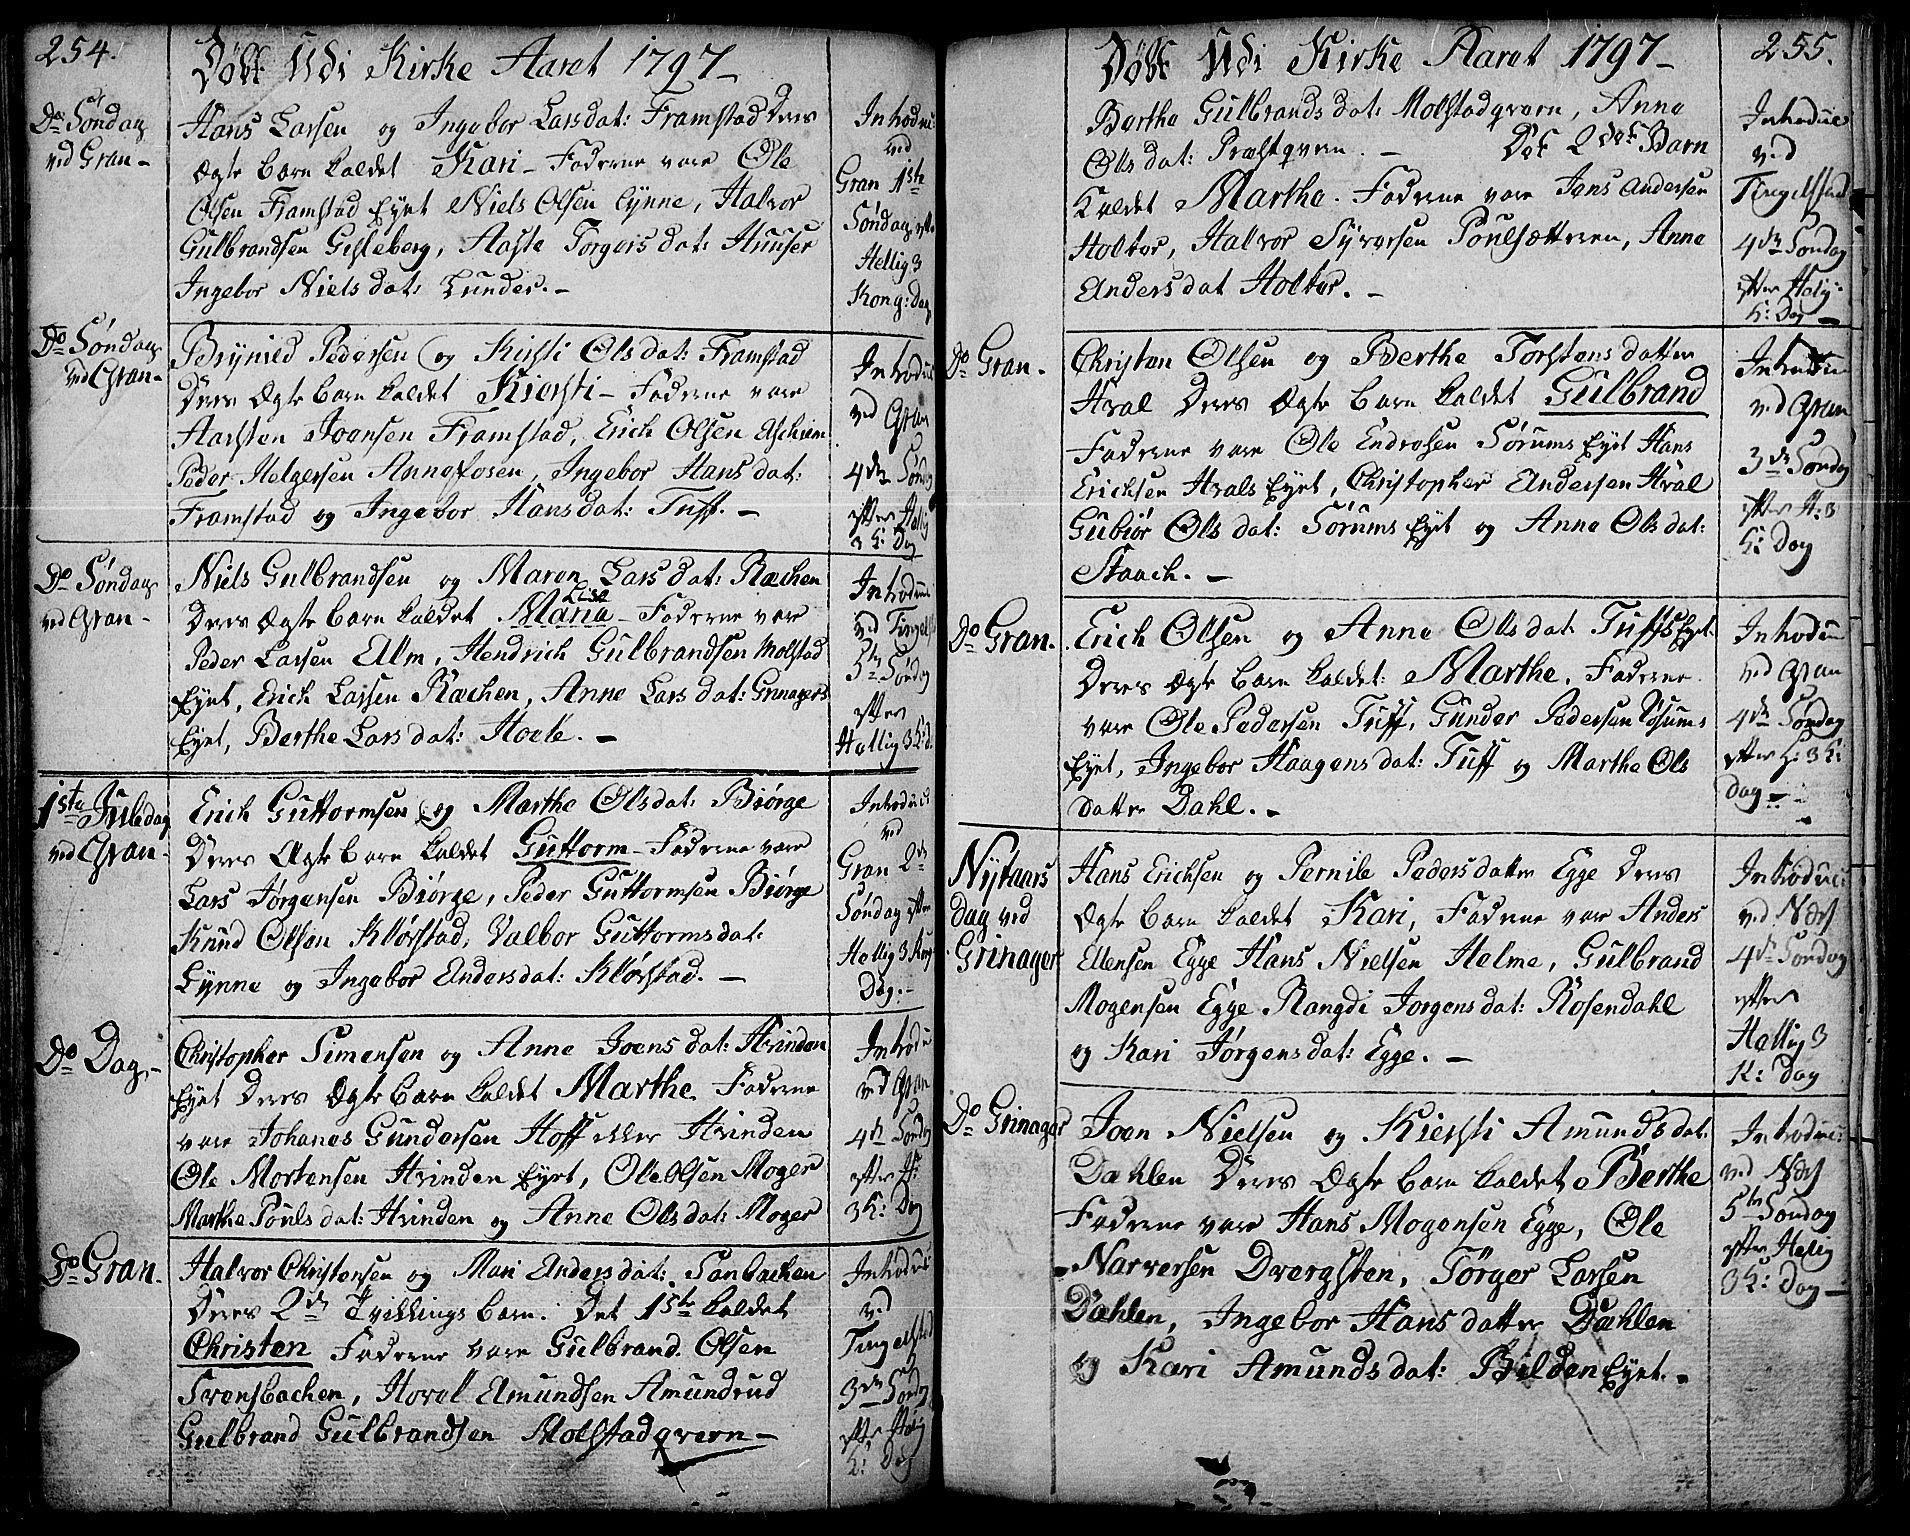 SAH, Gran prestekontor, Ministerialbok nr. 6, 1787-1824, s. 254-255